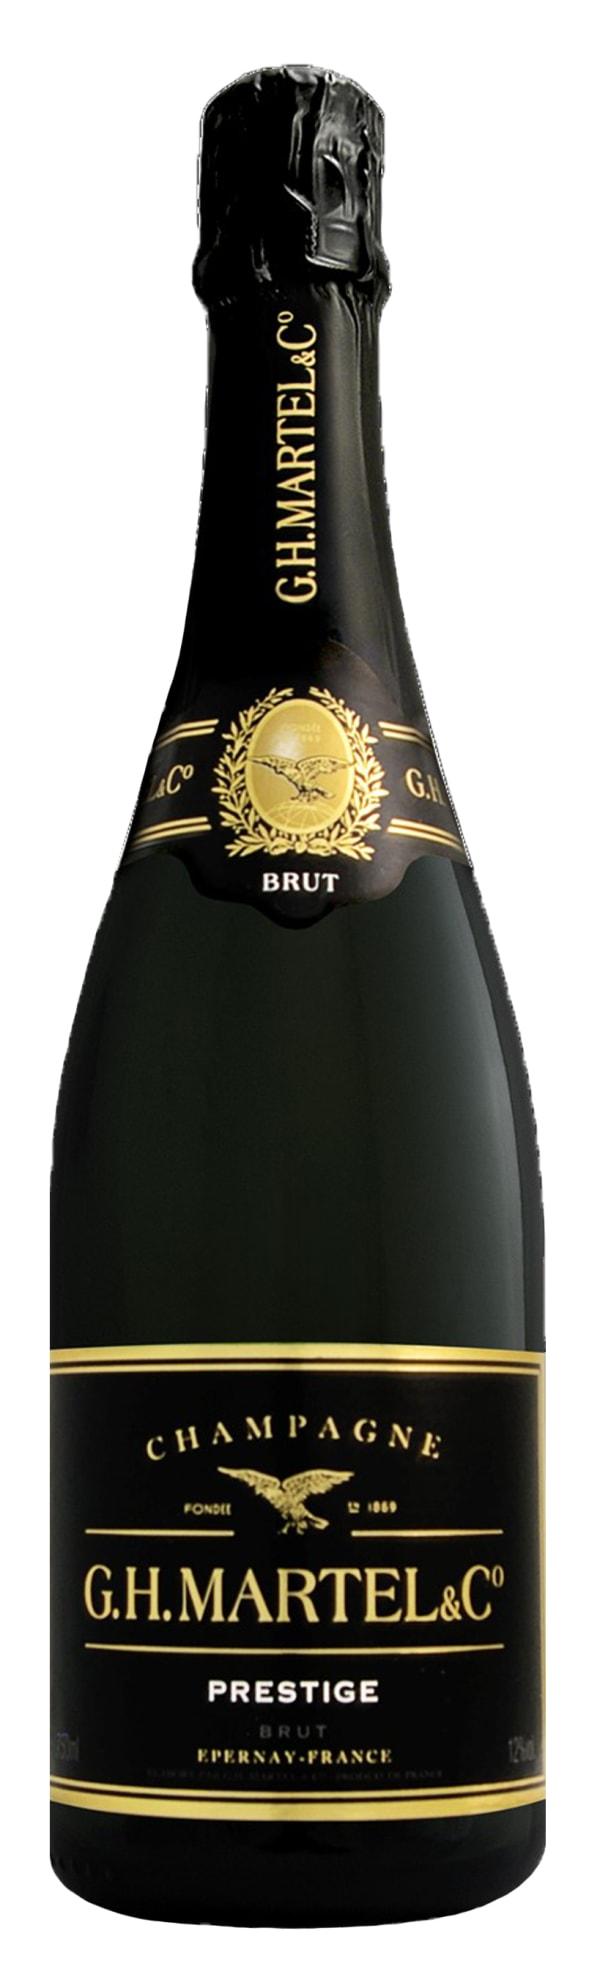 G.H. Martel&C˚ Prestige Champagne Brut